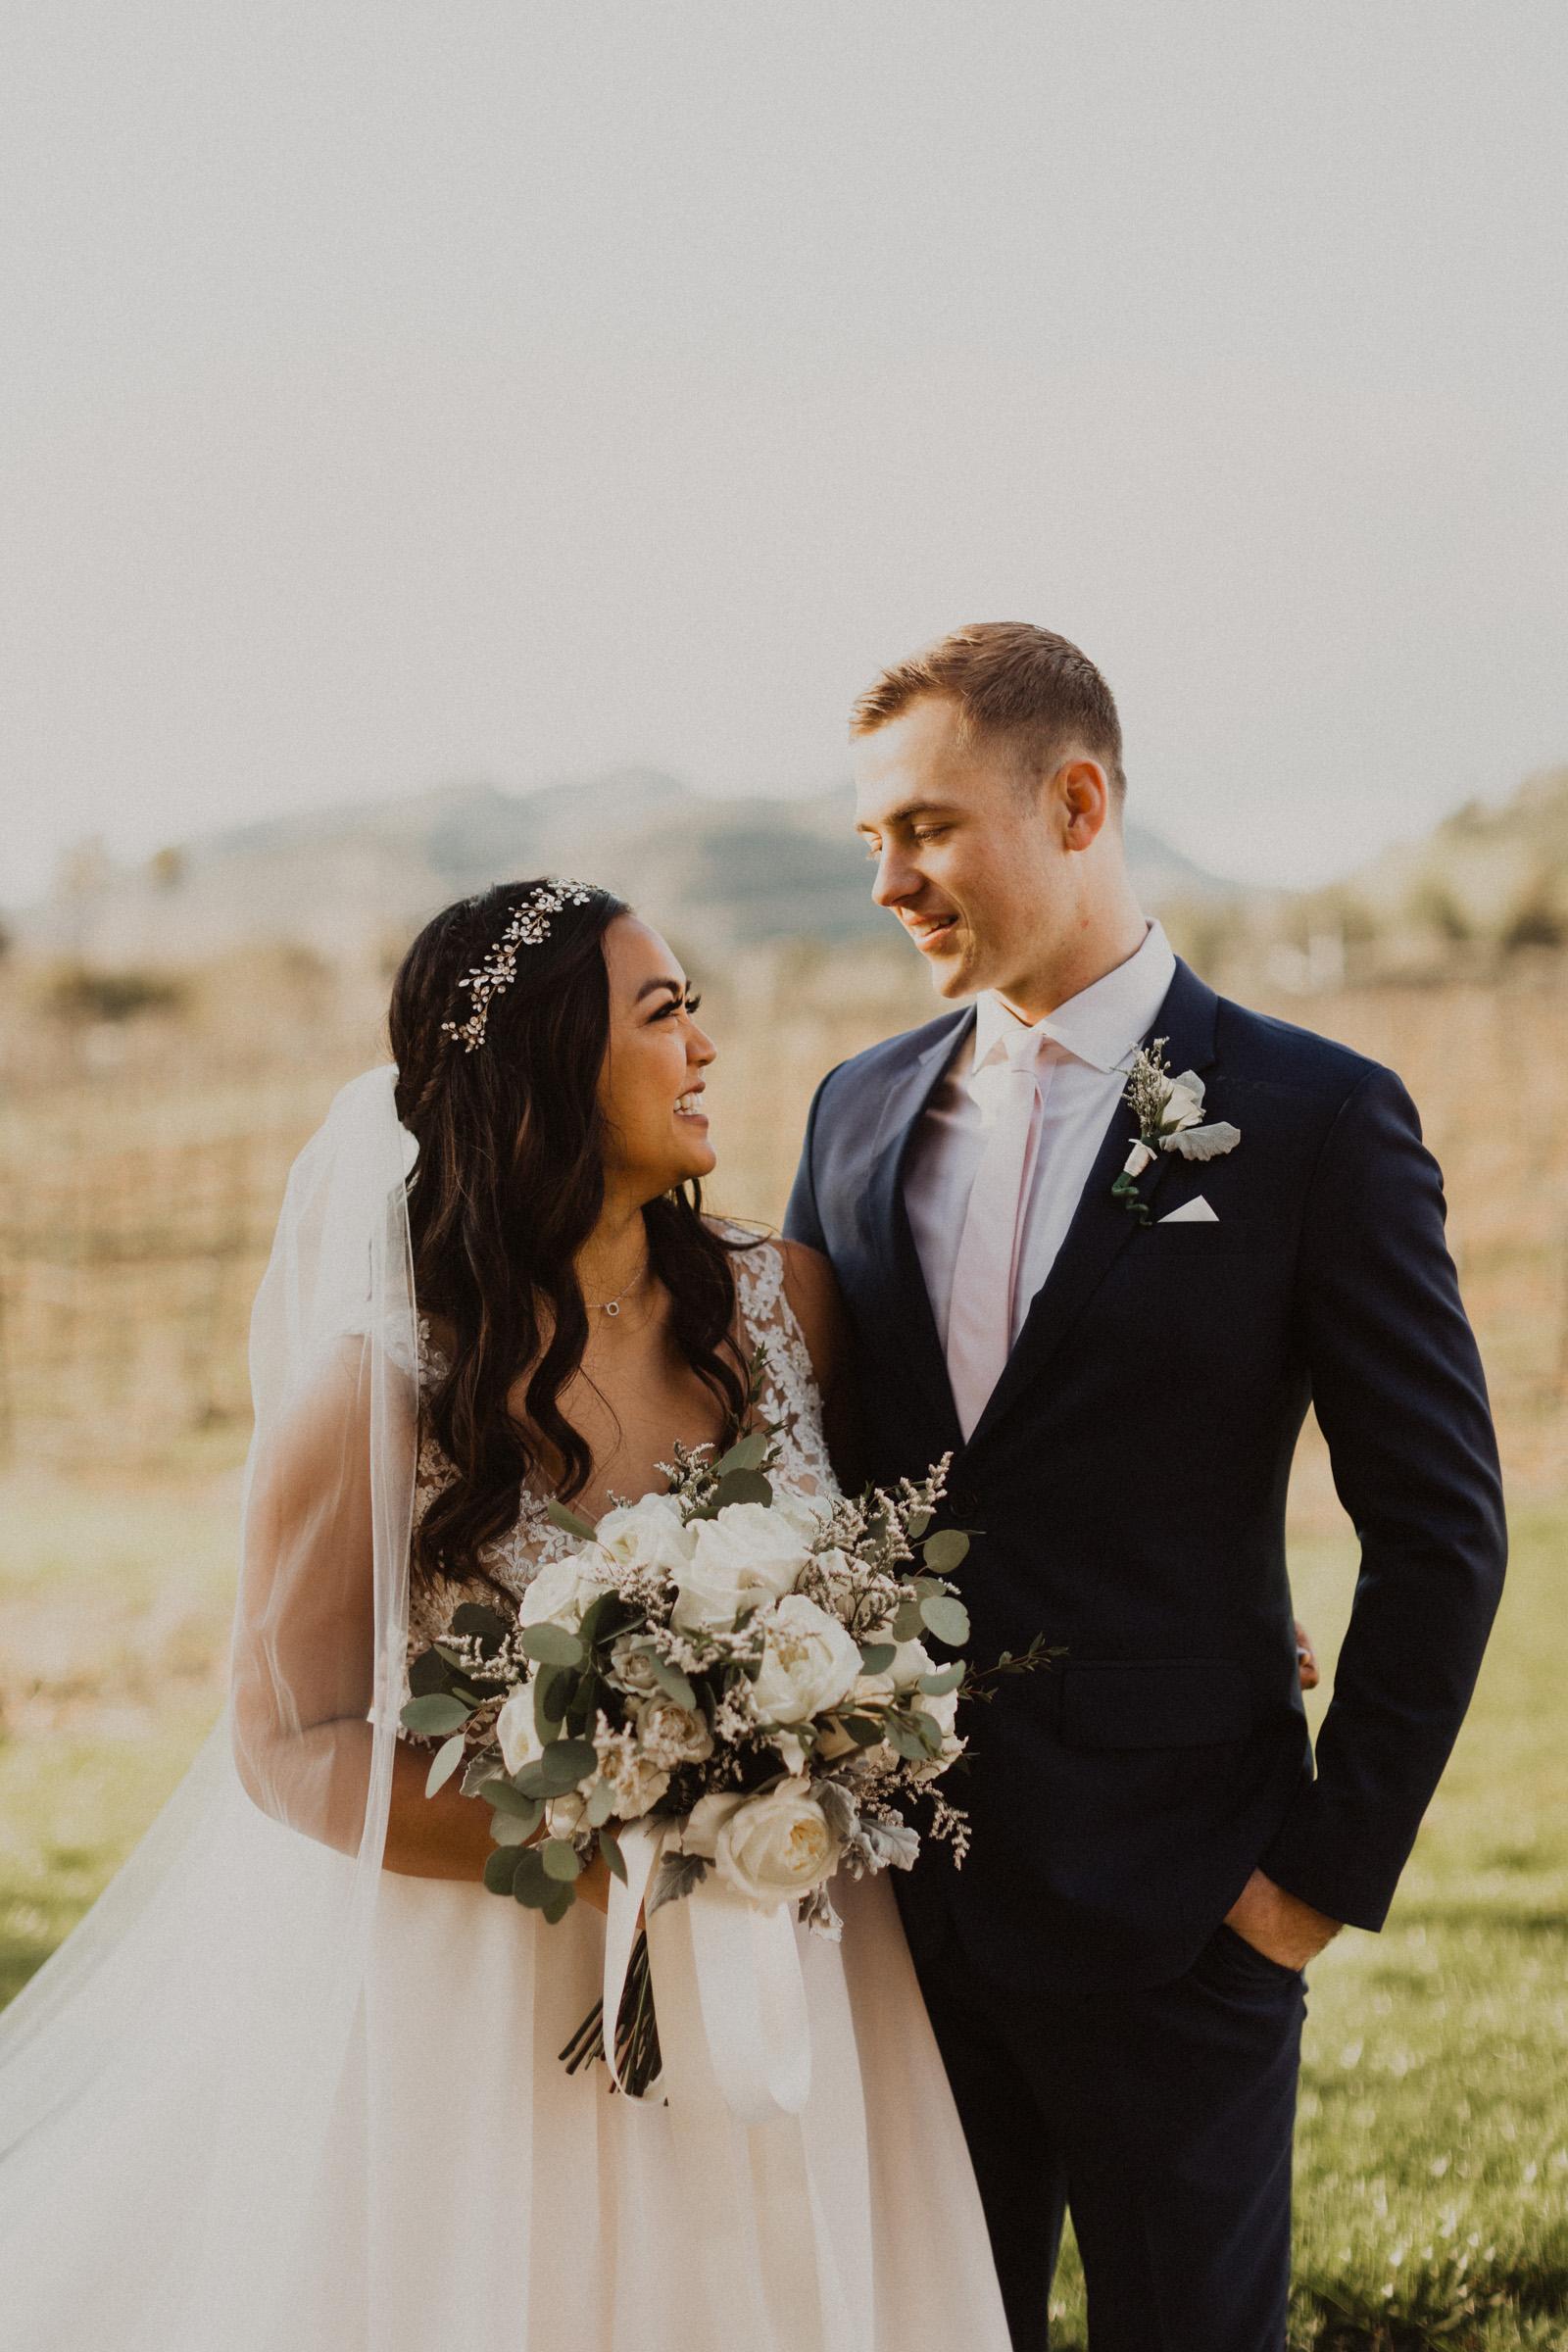 alyssa barletter photography destination wedding bay area san jose california winery photographer-56.jpg